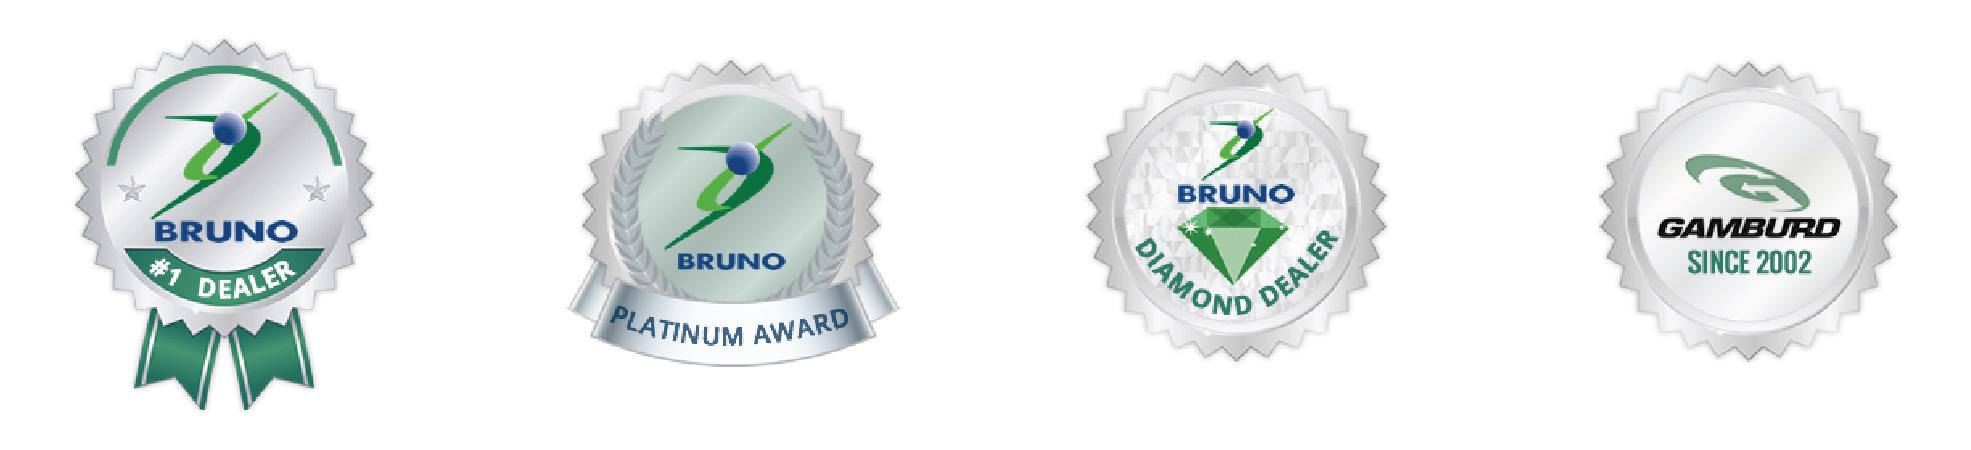 Gamburd badge